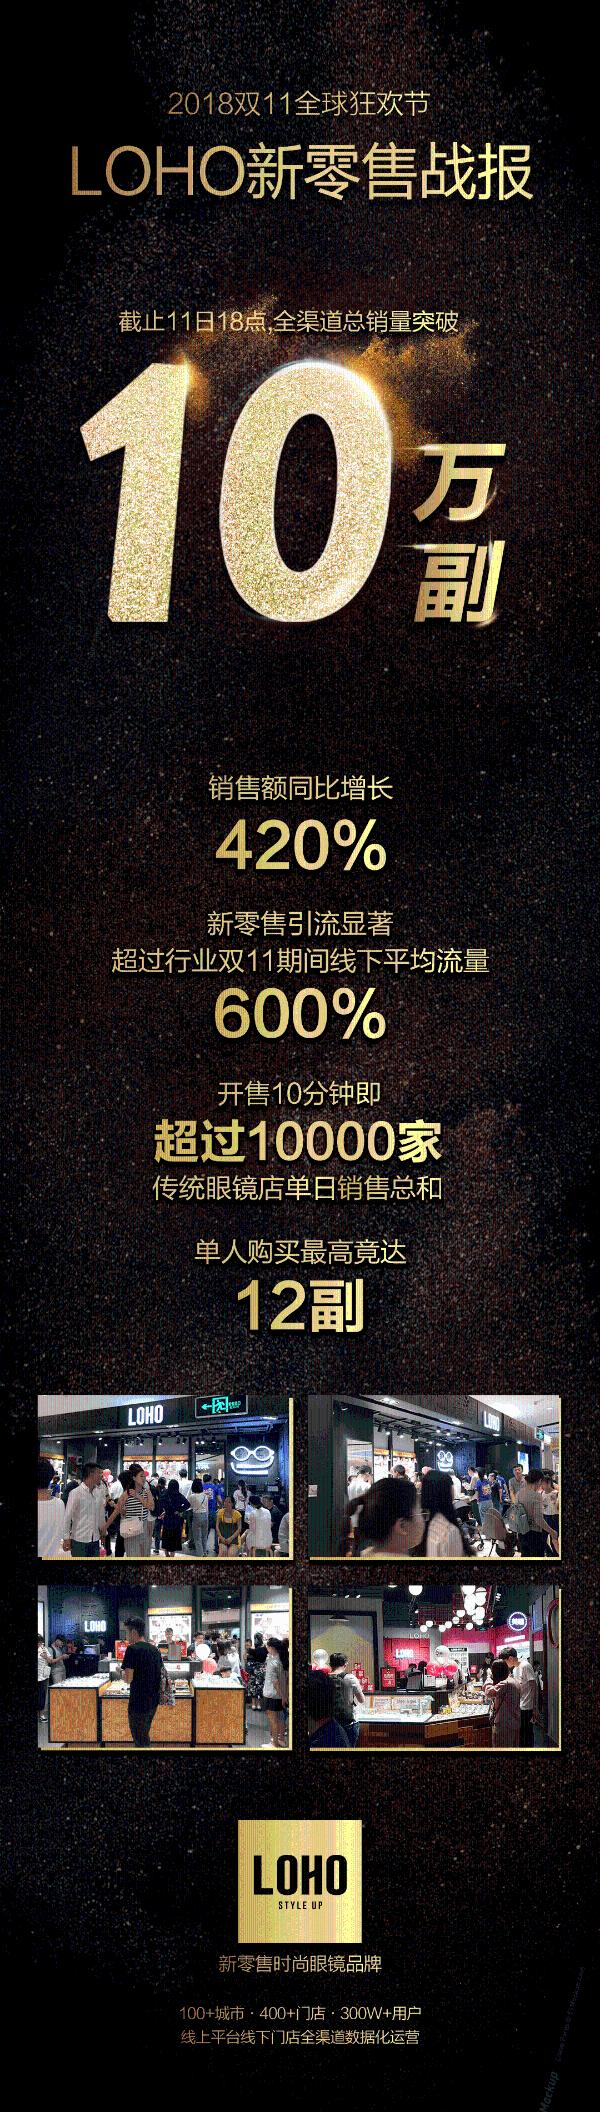 LOHO双11新零售成绩显著,销售增长420%,线下流量超行业600%